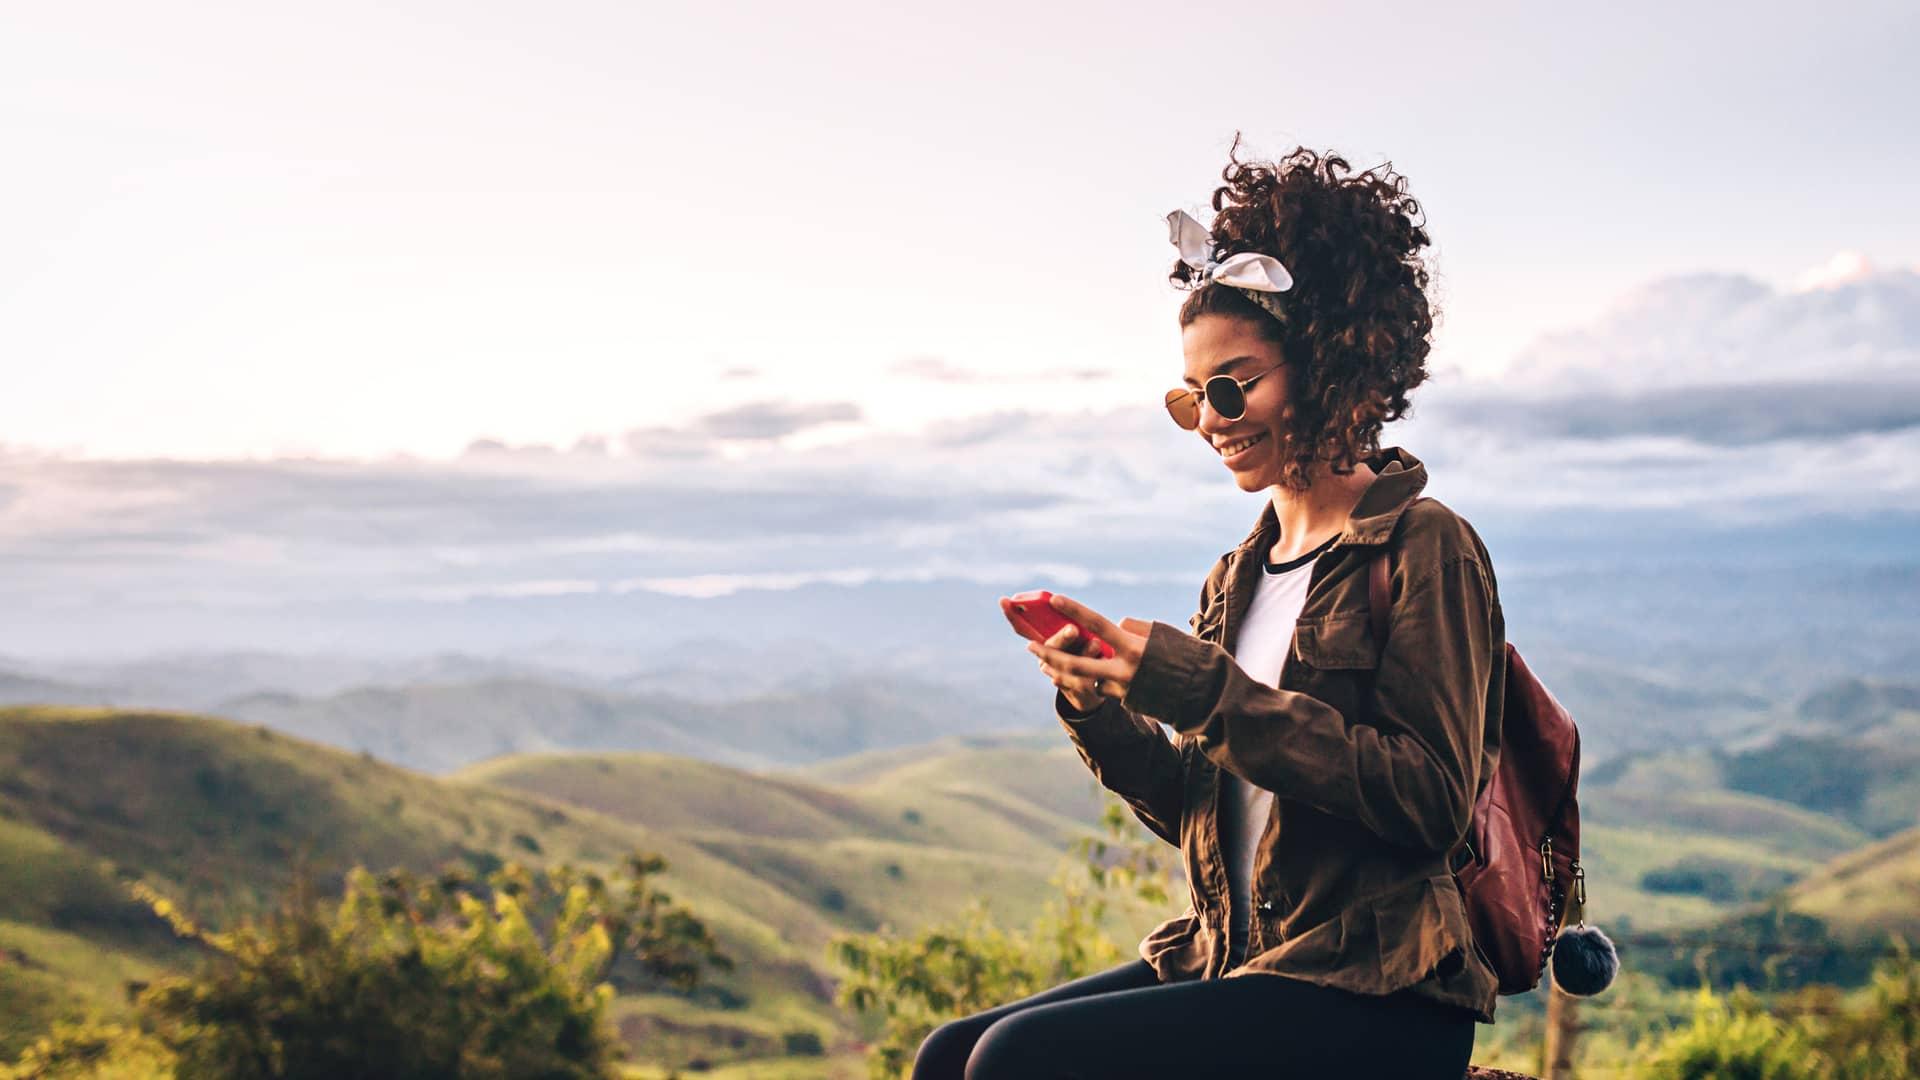 Joven leyendo un sms en su telefono móvil somboliza tarifa móvil barata